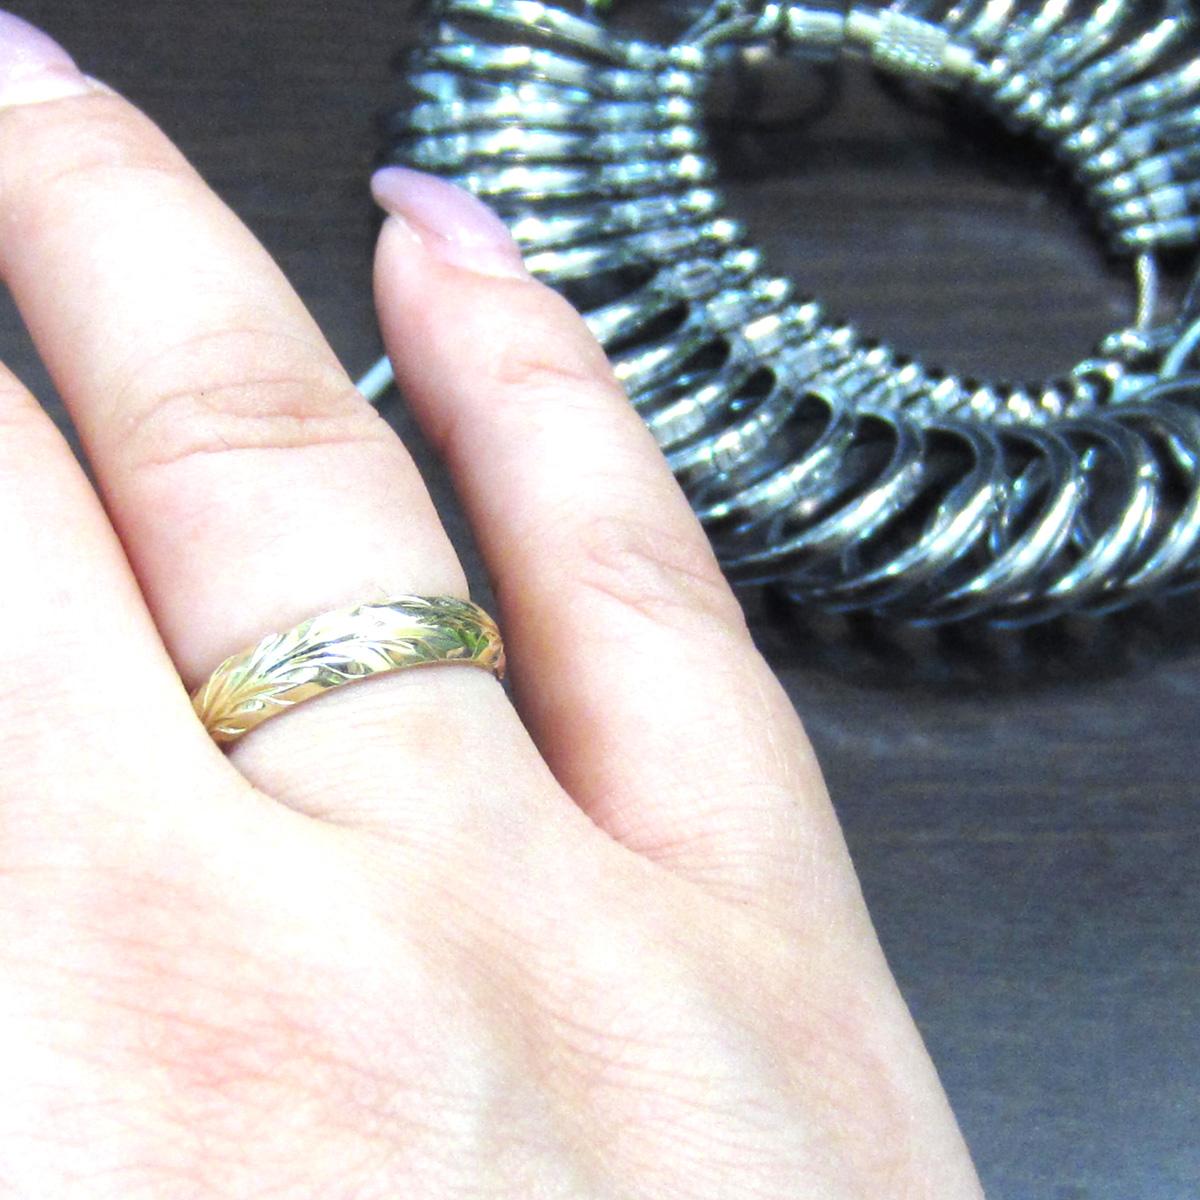 new arrival bb1f8 0851a プロがアドバイスする指輪のサイズを測る方法とポイント ...